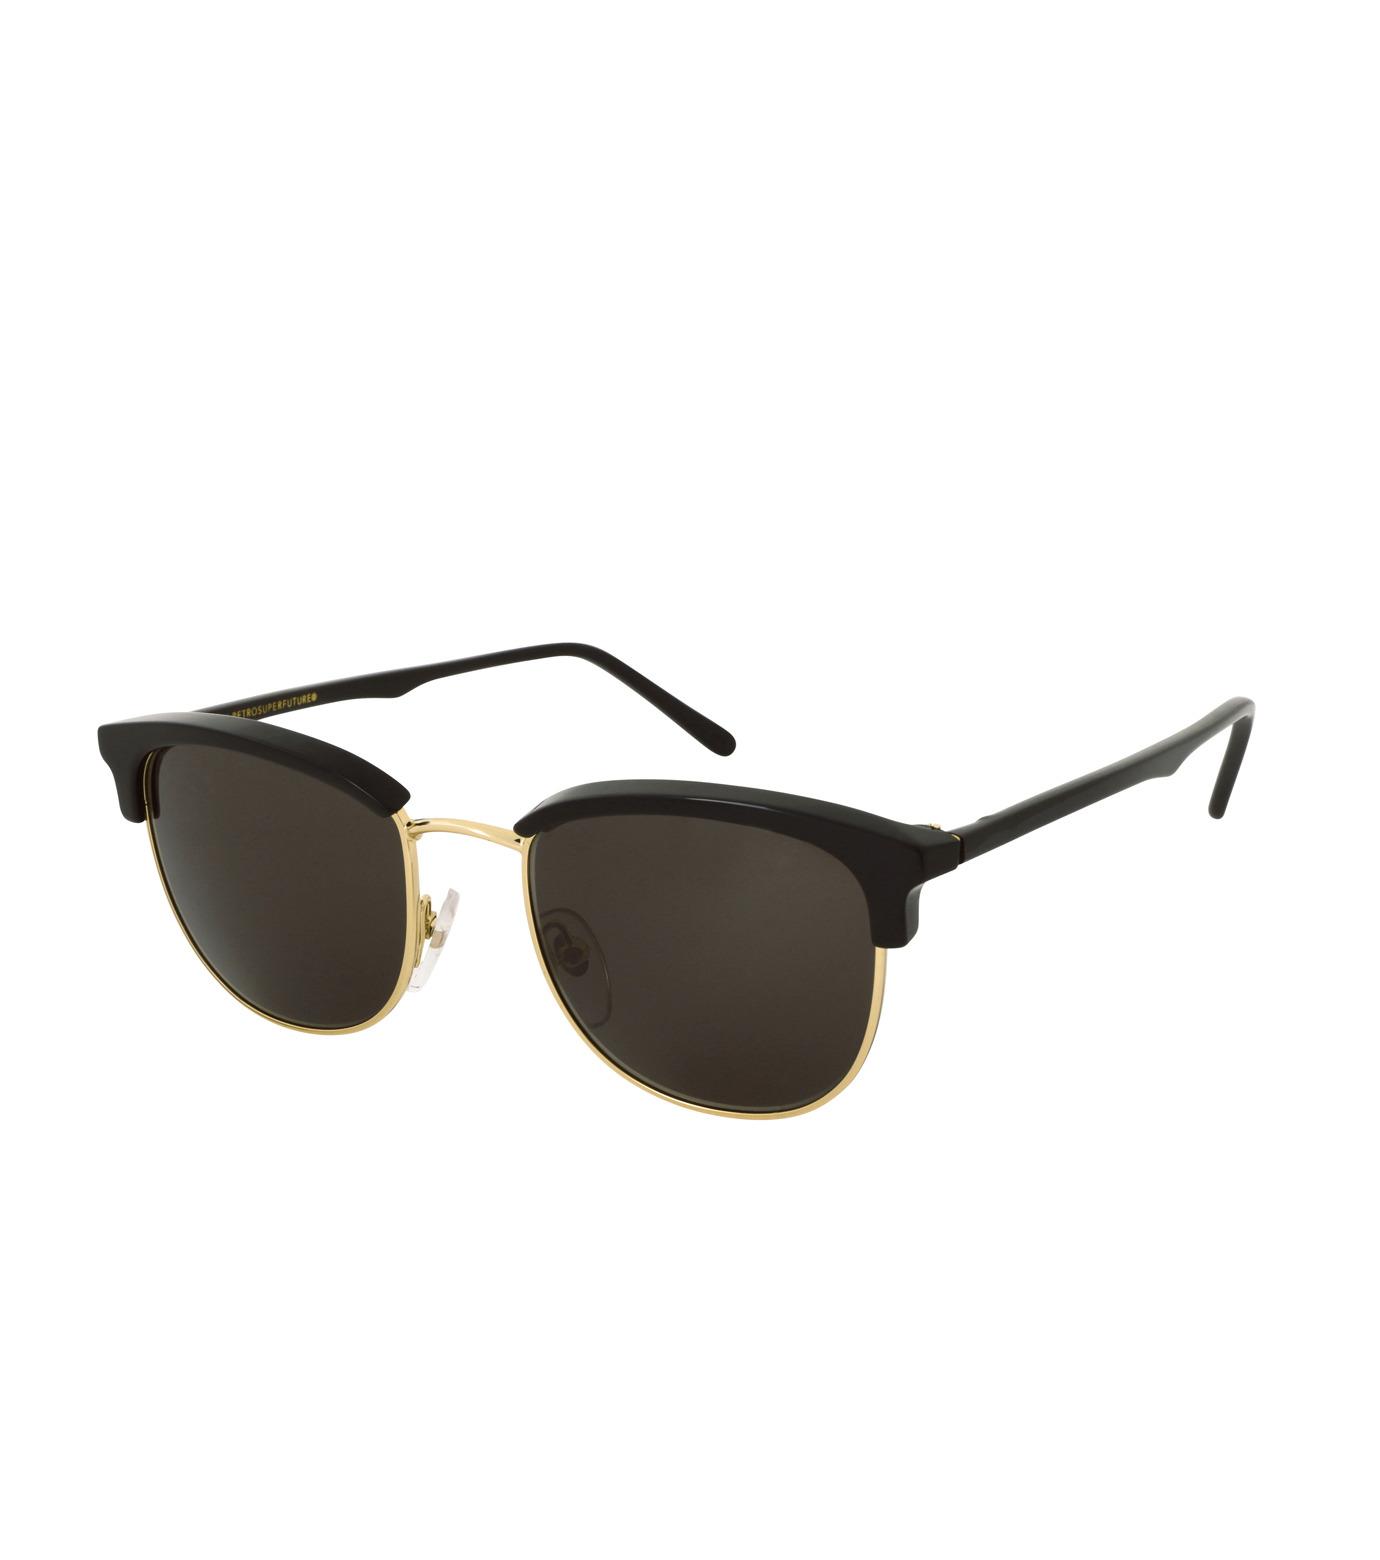 SUPER(スーパー)のTERAZZO BLACK-BLACK(アイウェア/eyewear)-SPRXXXX050-13 拡大詳細画像1